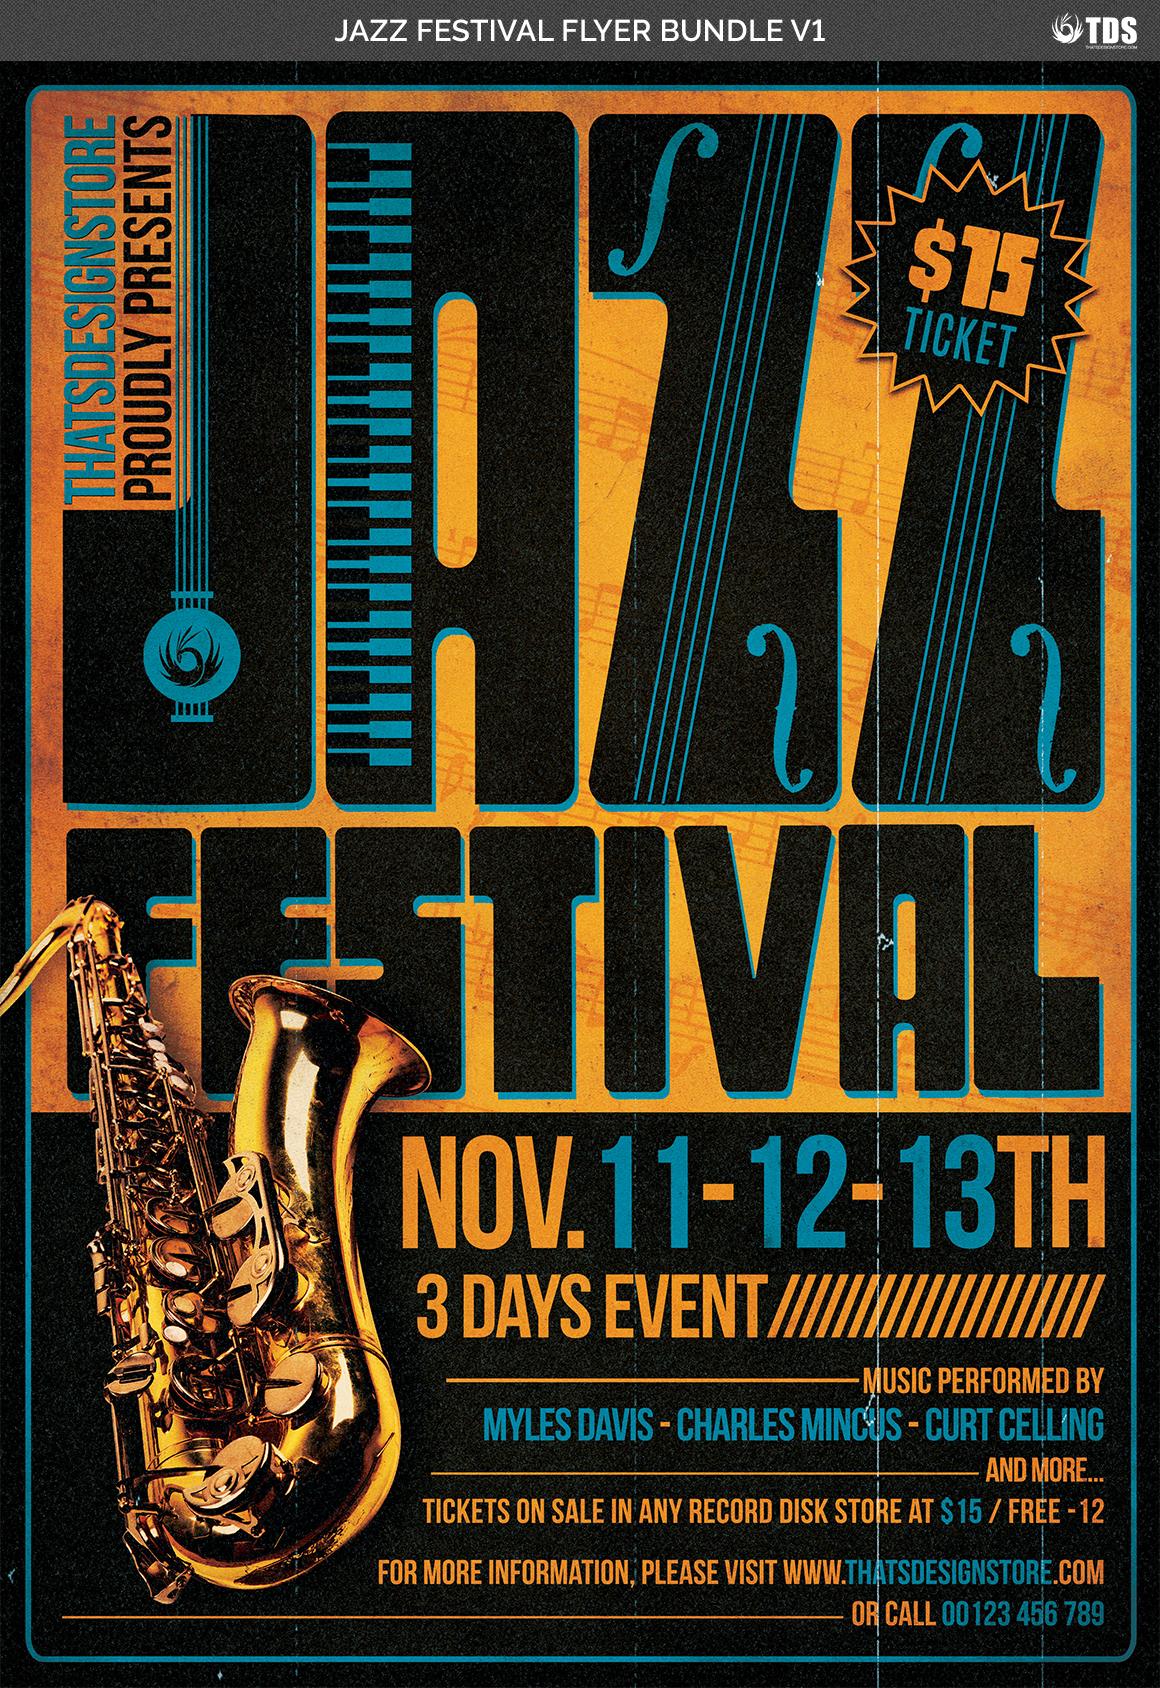 Jazz Festival Flyer Bundle V1 example image 6